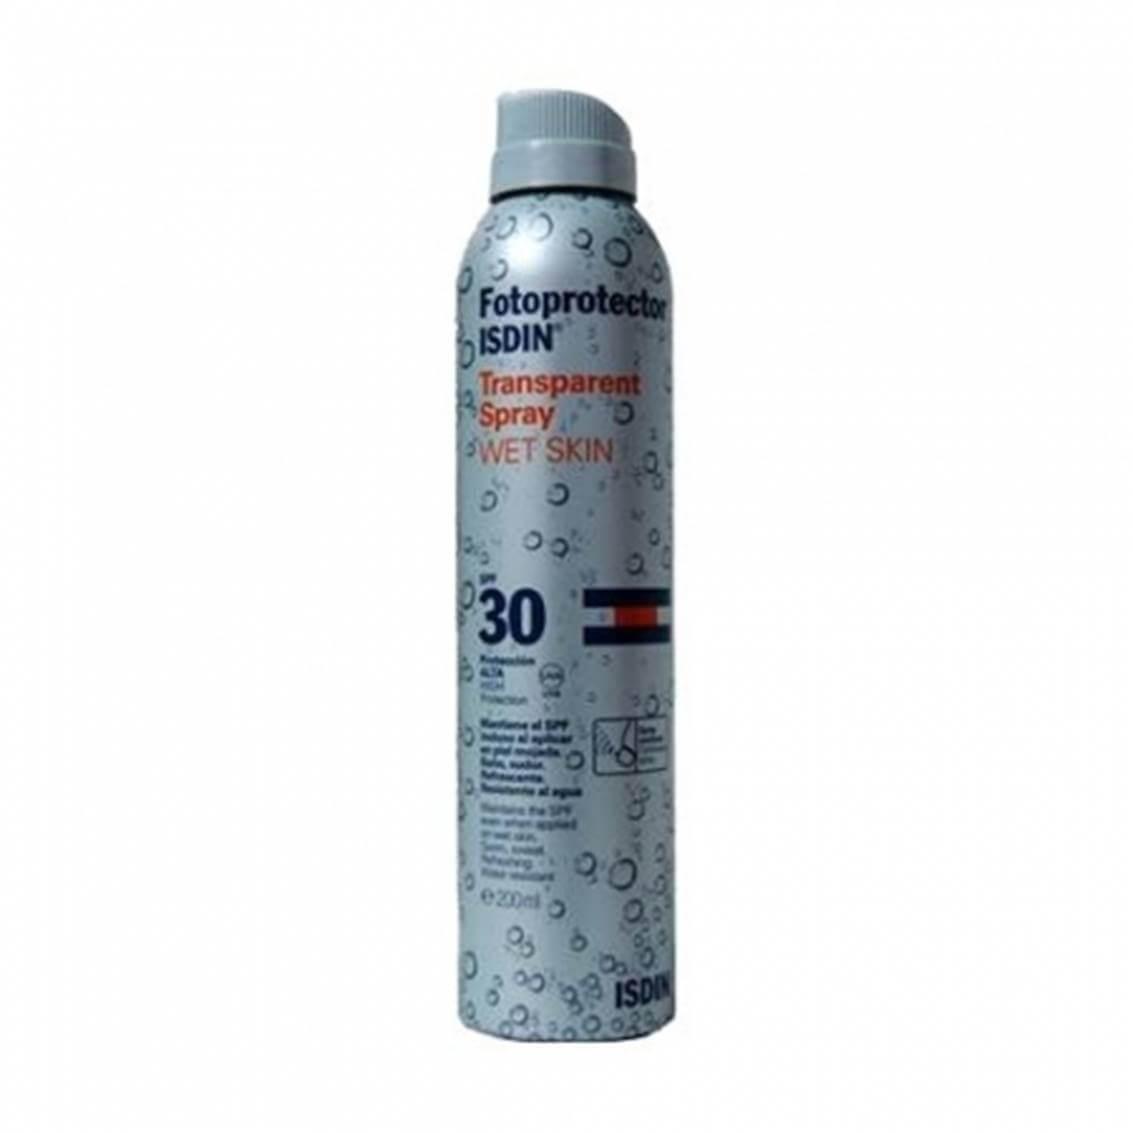 Fotoprotector isdin wet skin spray spf 30 200 ml